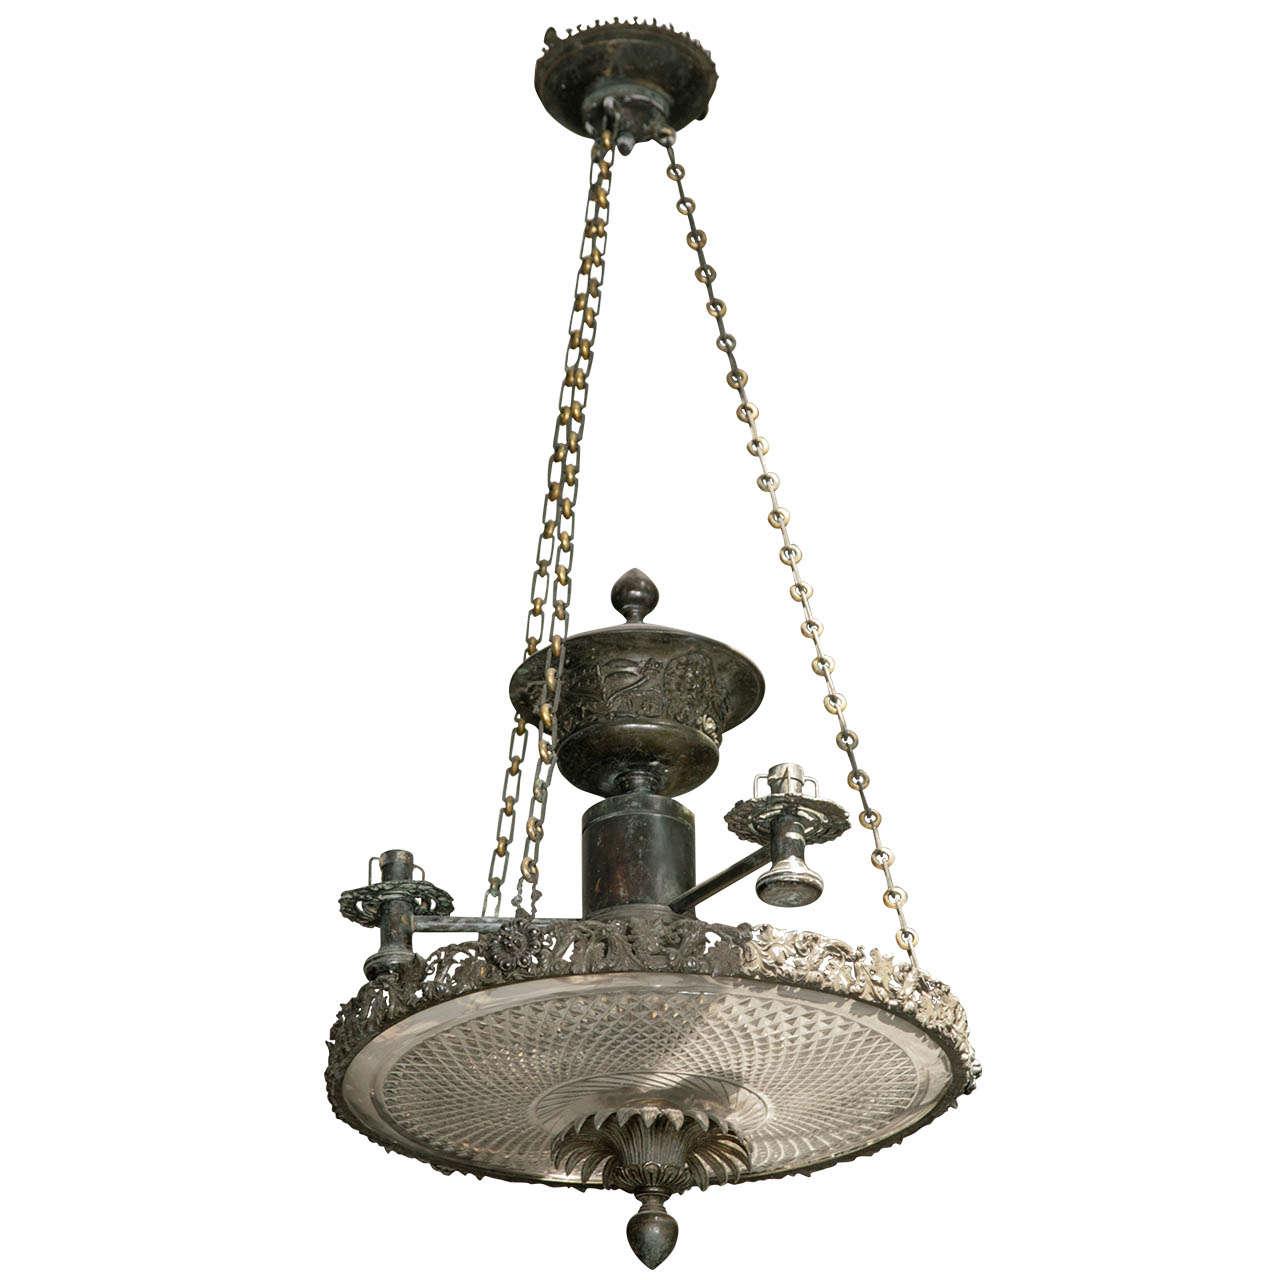 Exceptionally Fine Irish Bronze Colza Oil Lamp At 1stdibs